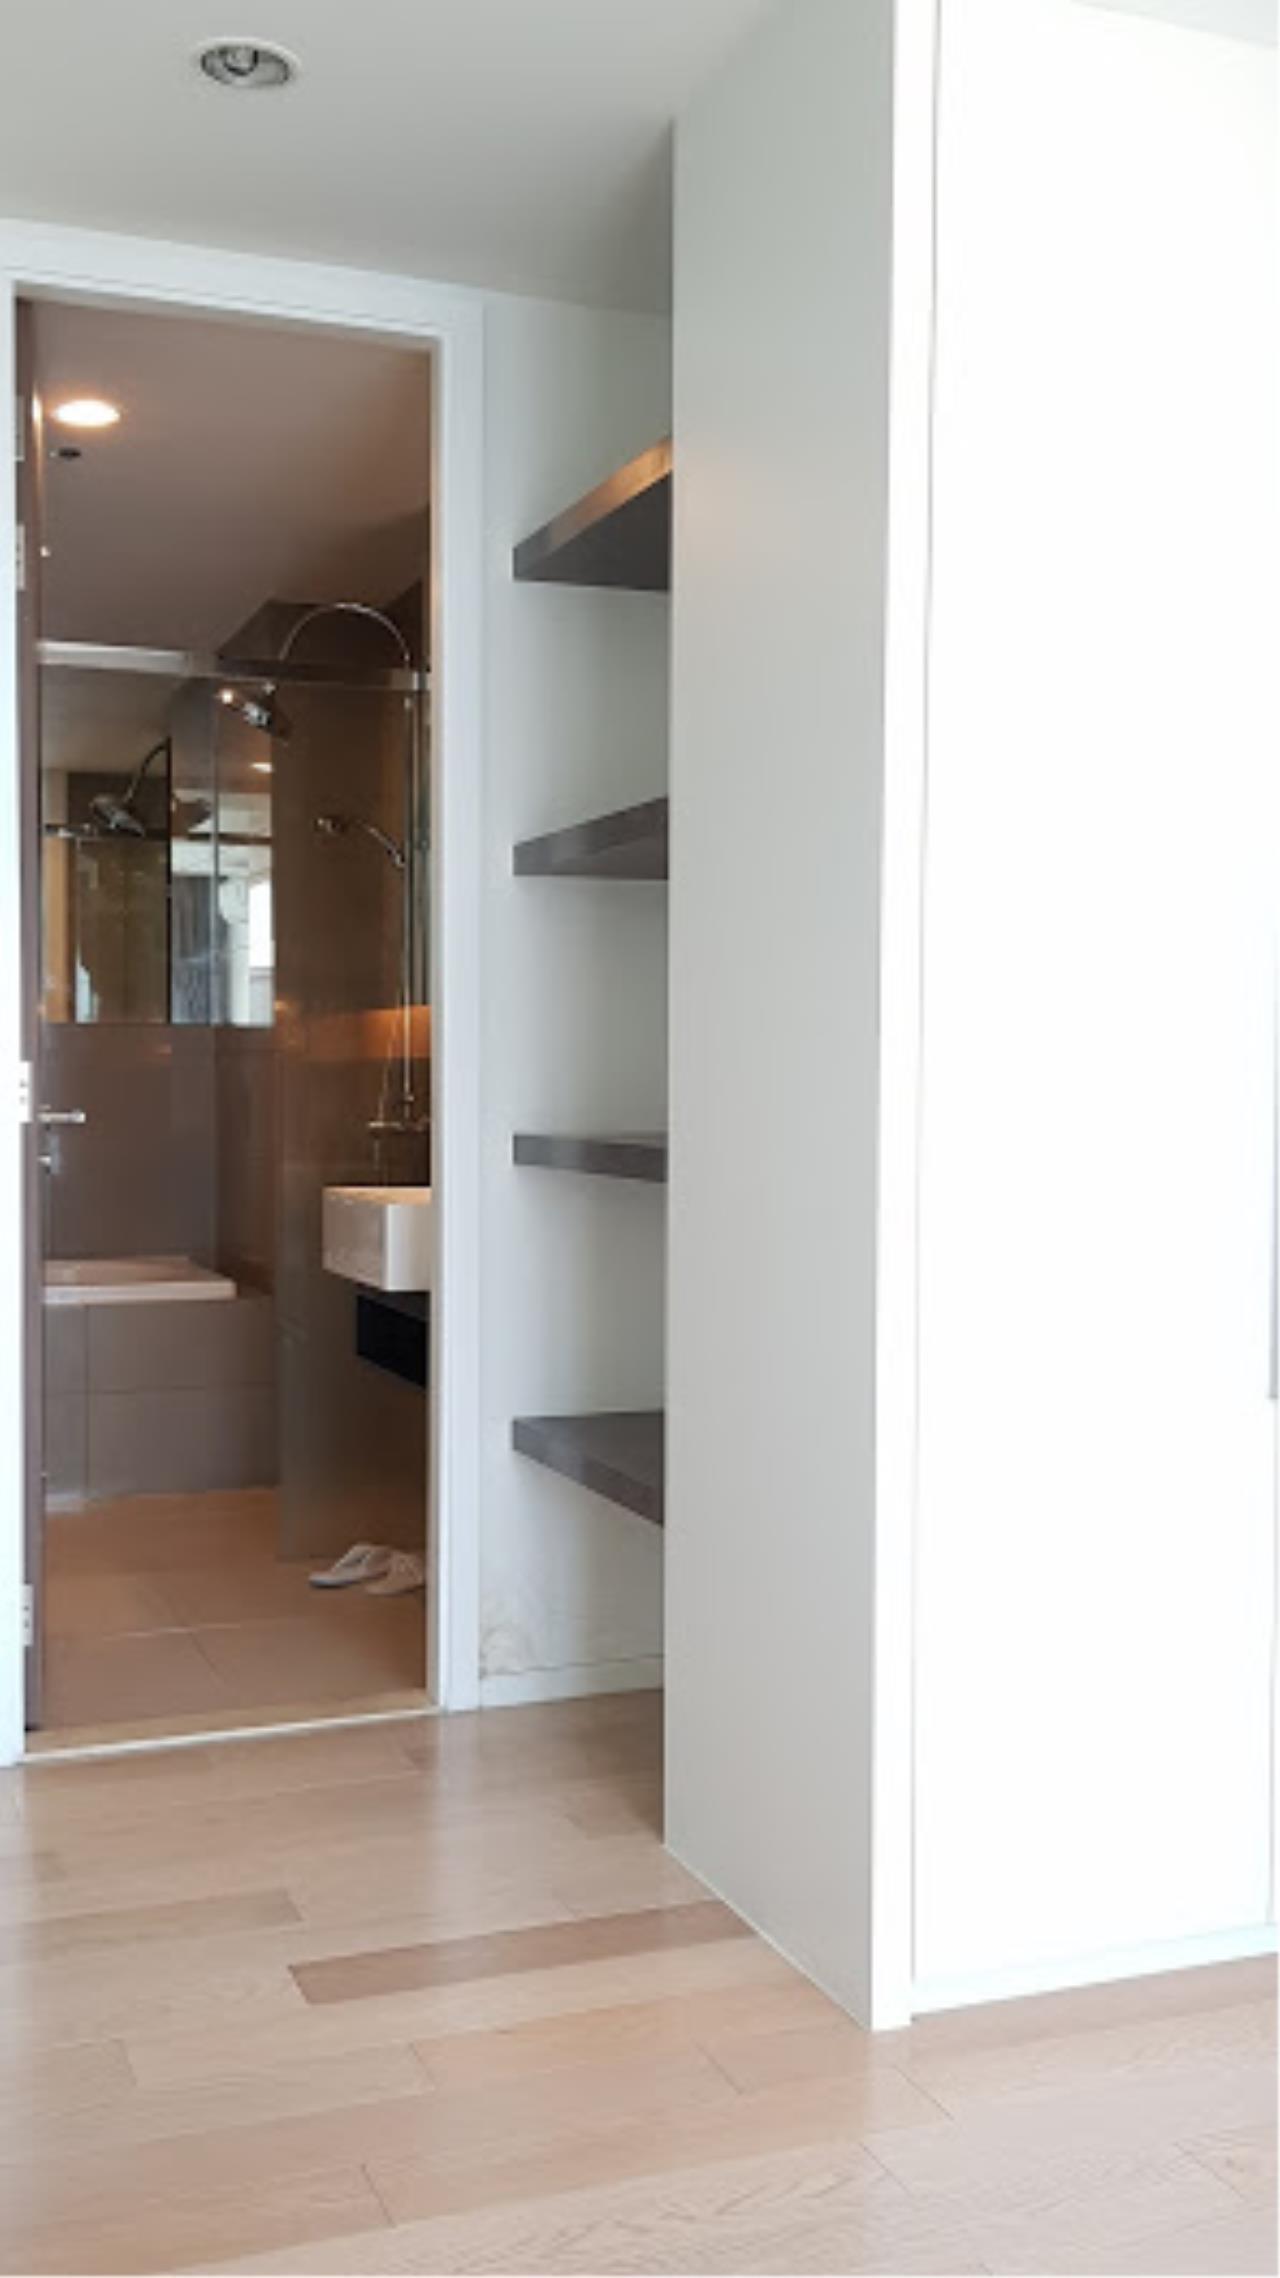 Quality Life Property Agency's S A L E & R E N T ! 15 Sukhumvit Residence | 1 BED 1 BATH | 59.29 SQ. M. 5